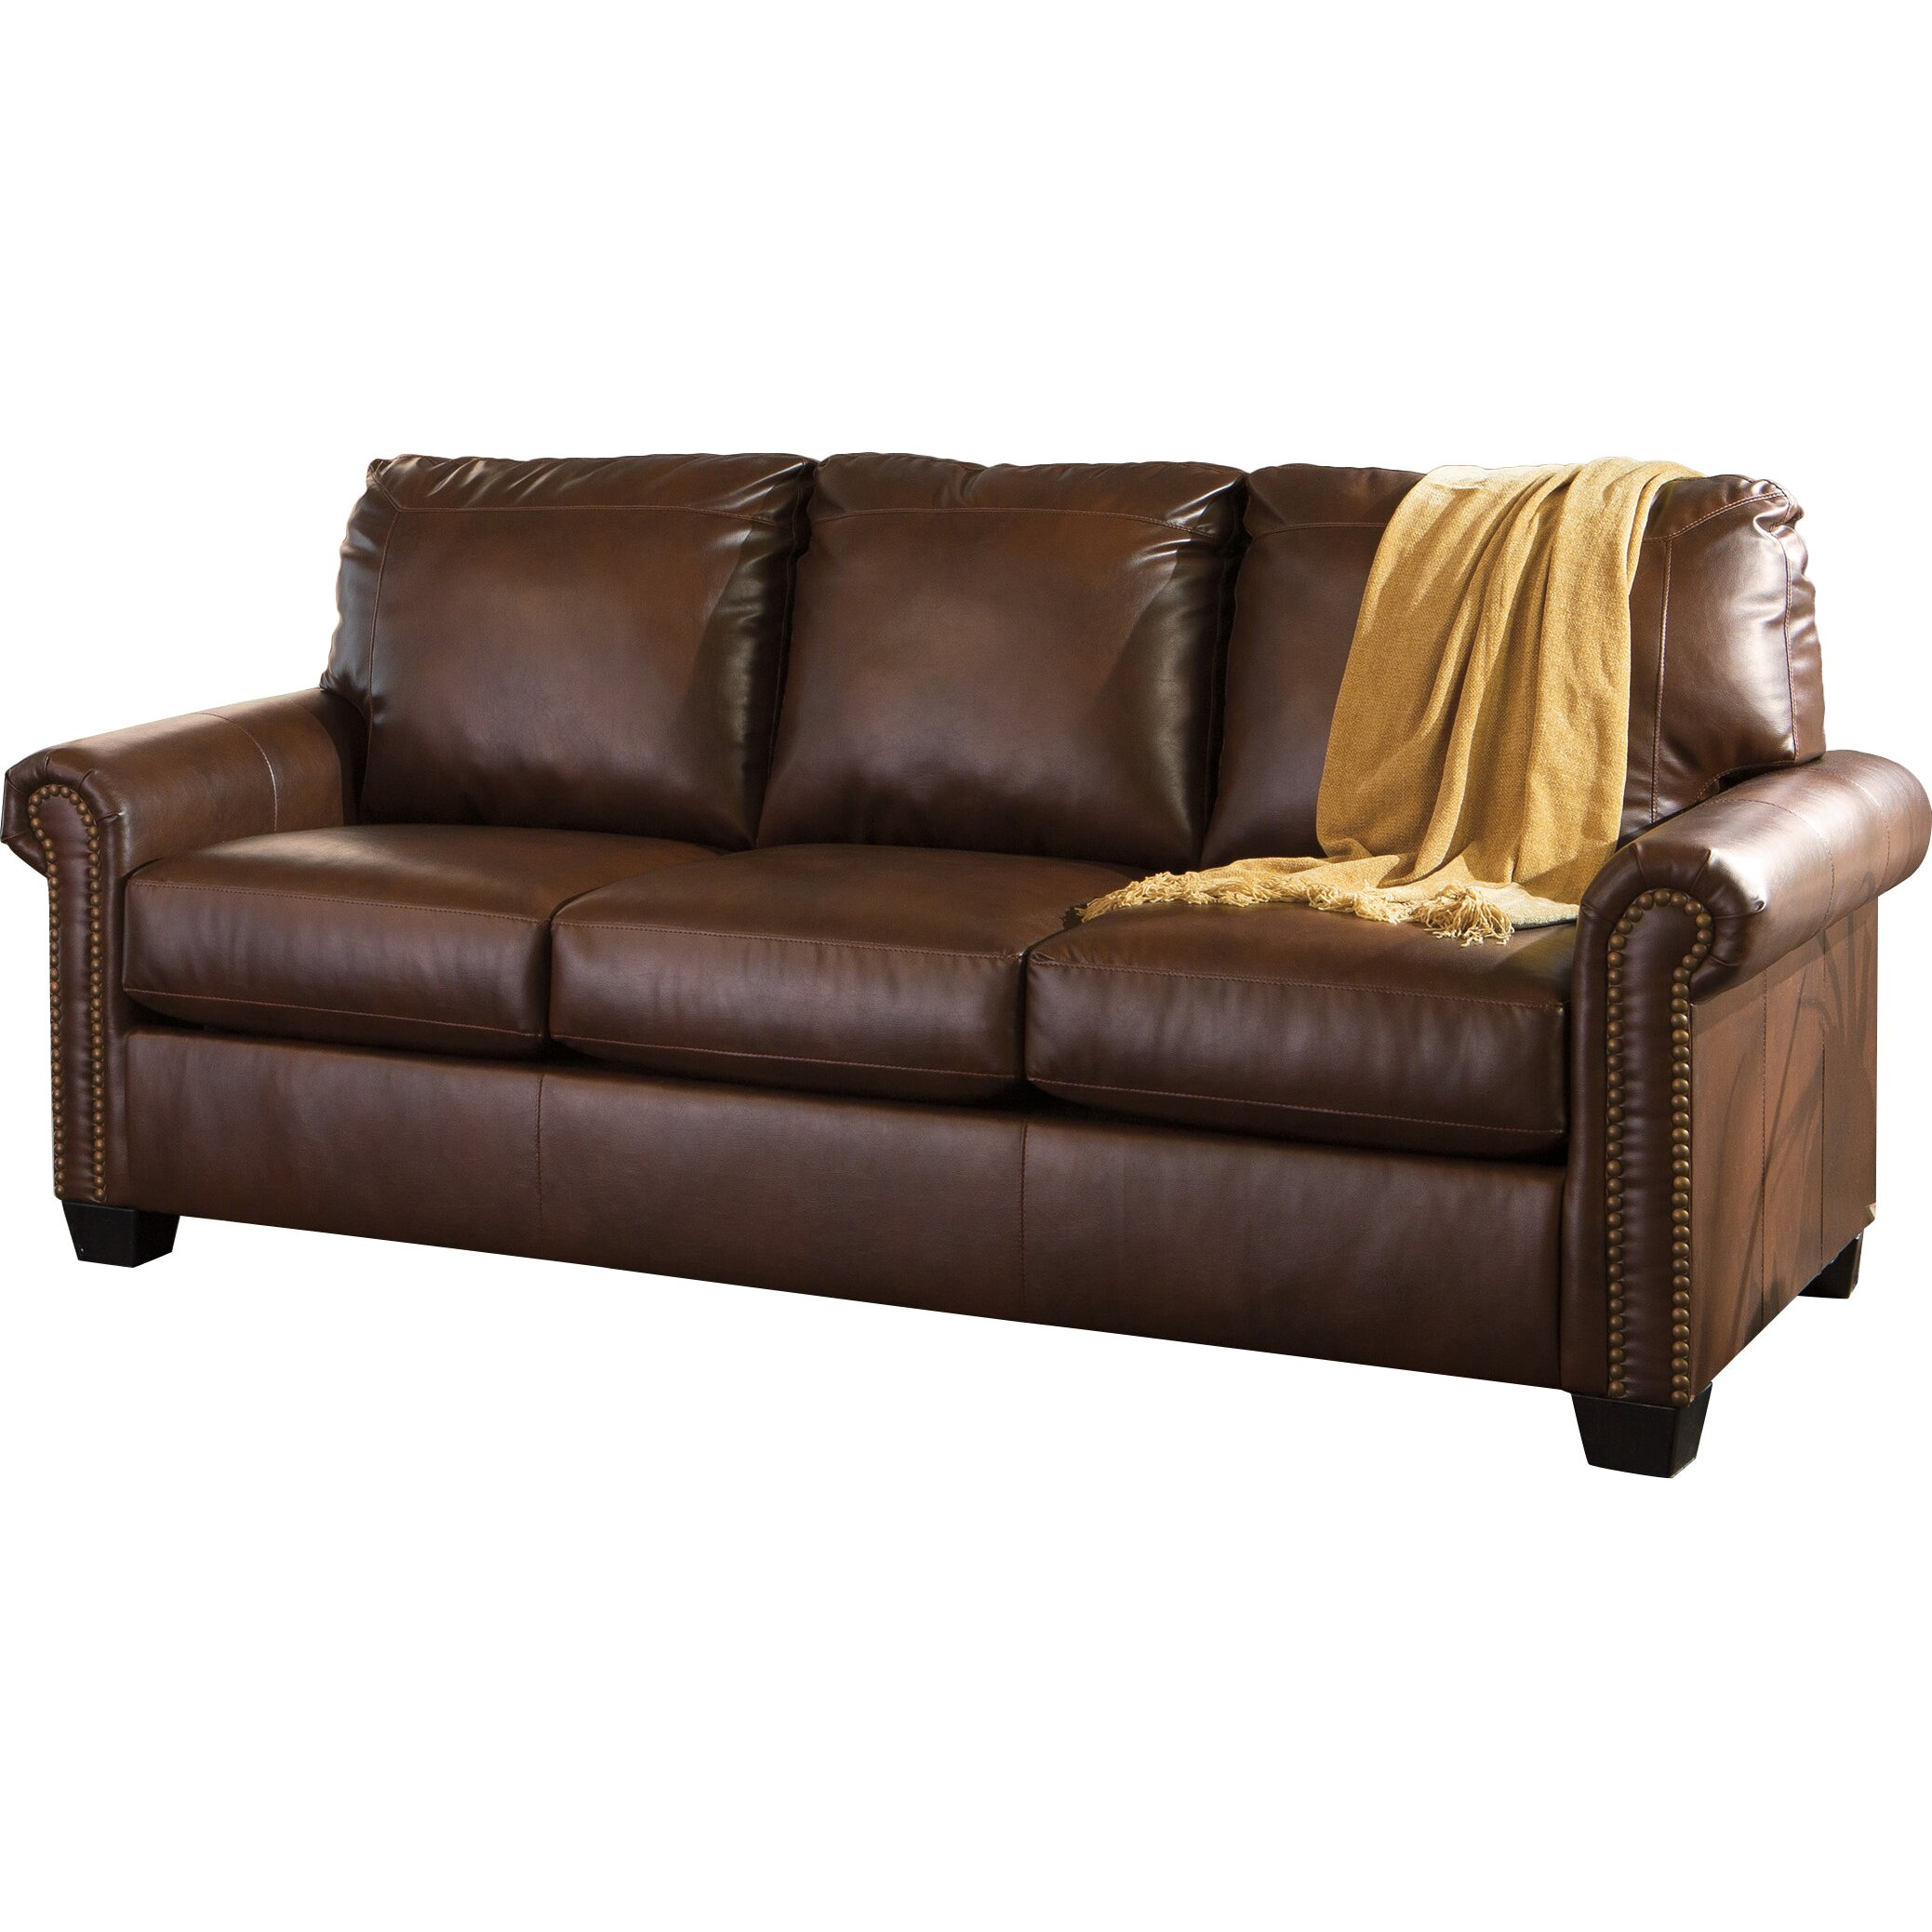 signature design by ashley lottie durablend queen sleeper sofa